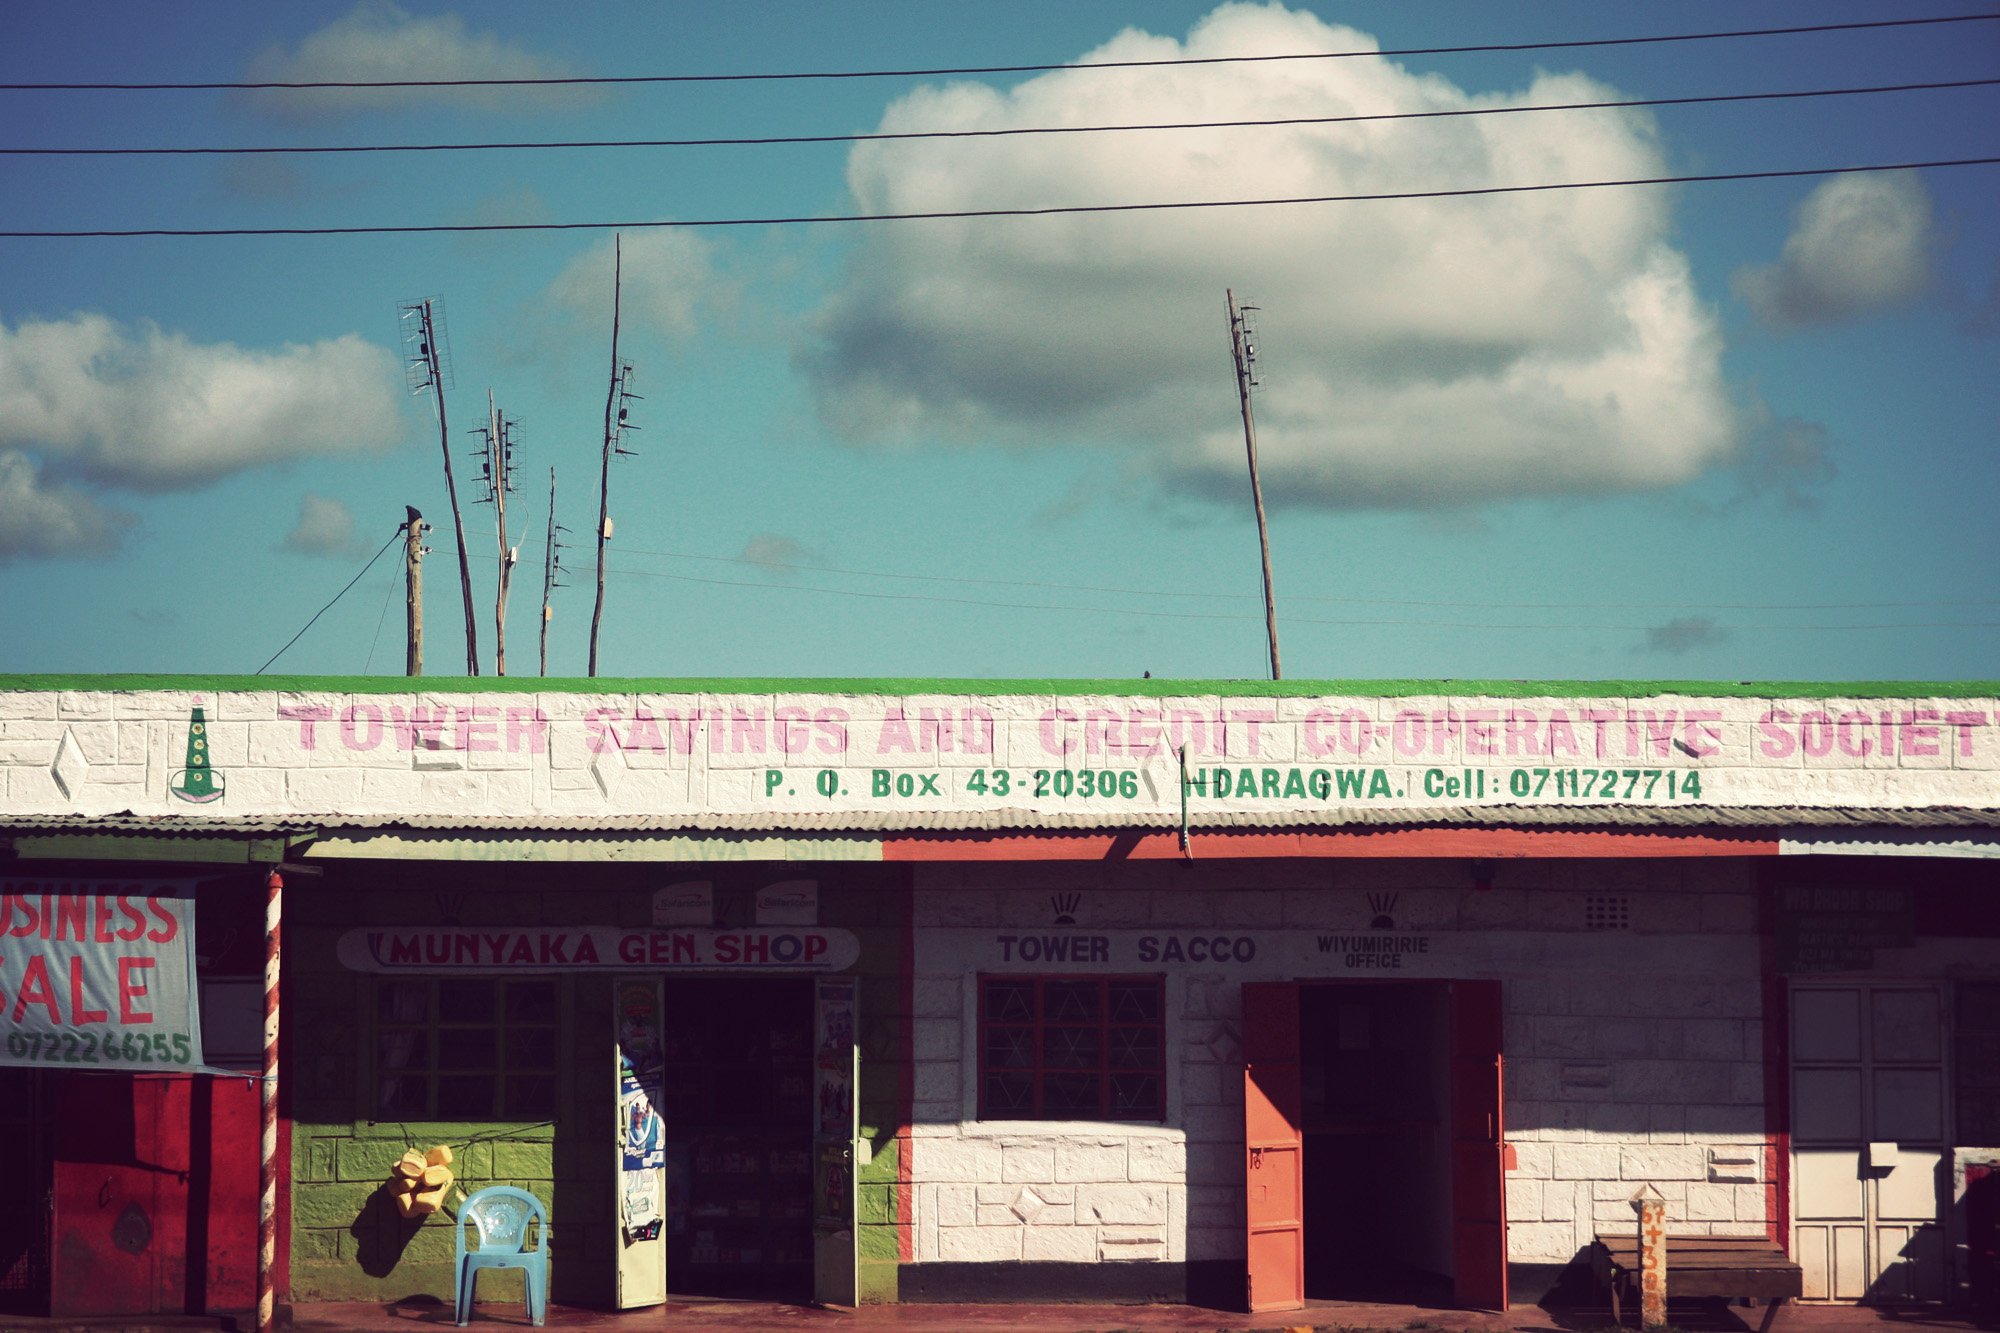 Day03_Mount-Kenya-to-Lake-Naivasha_Town-Facades_01.jpg